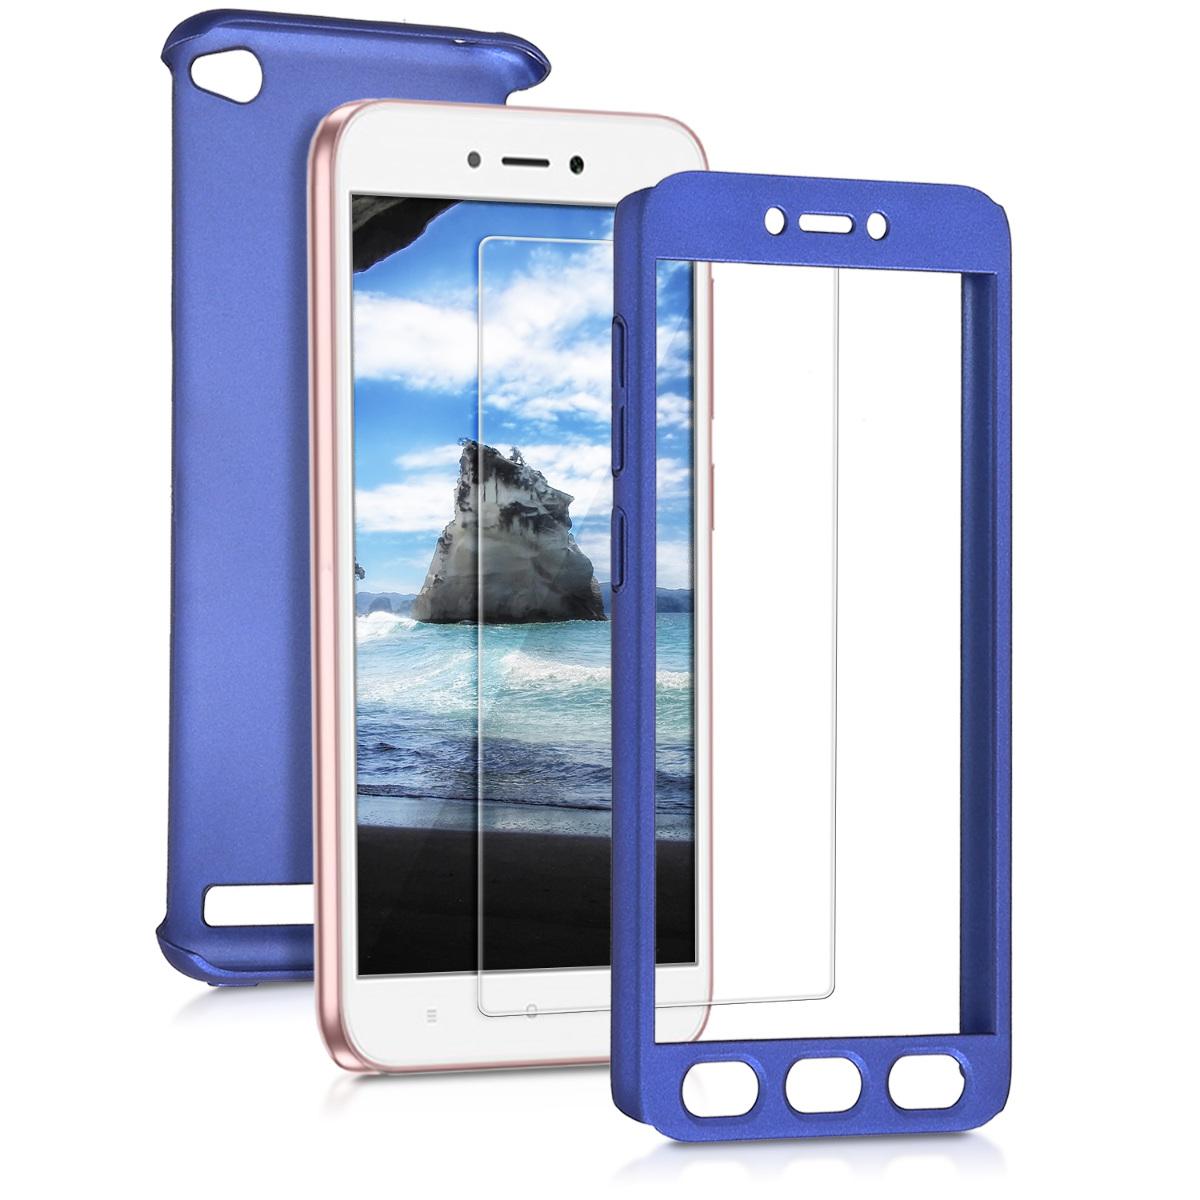 KW Θήκη Full Body Xiaomi Redmi 5A & Tempered Glass - Μπλε μεταλλικό (44997.64)